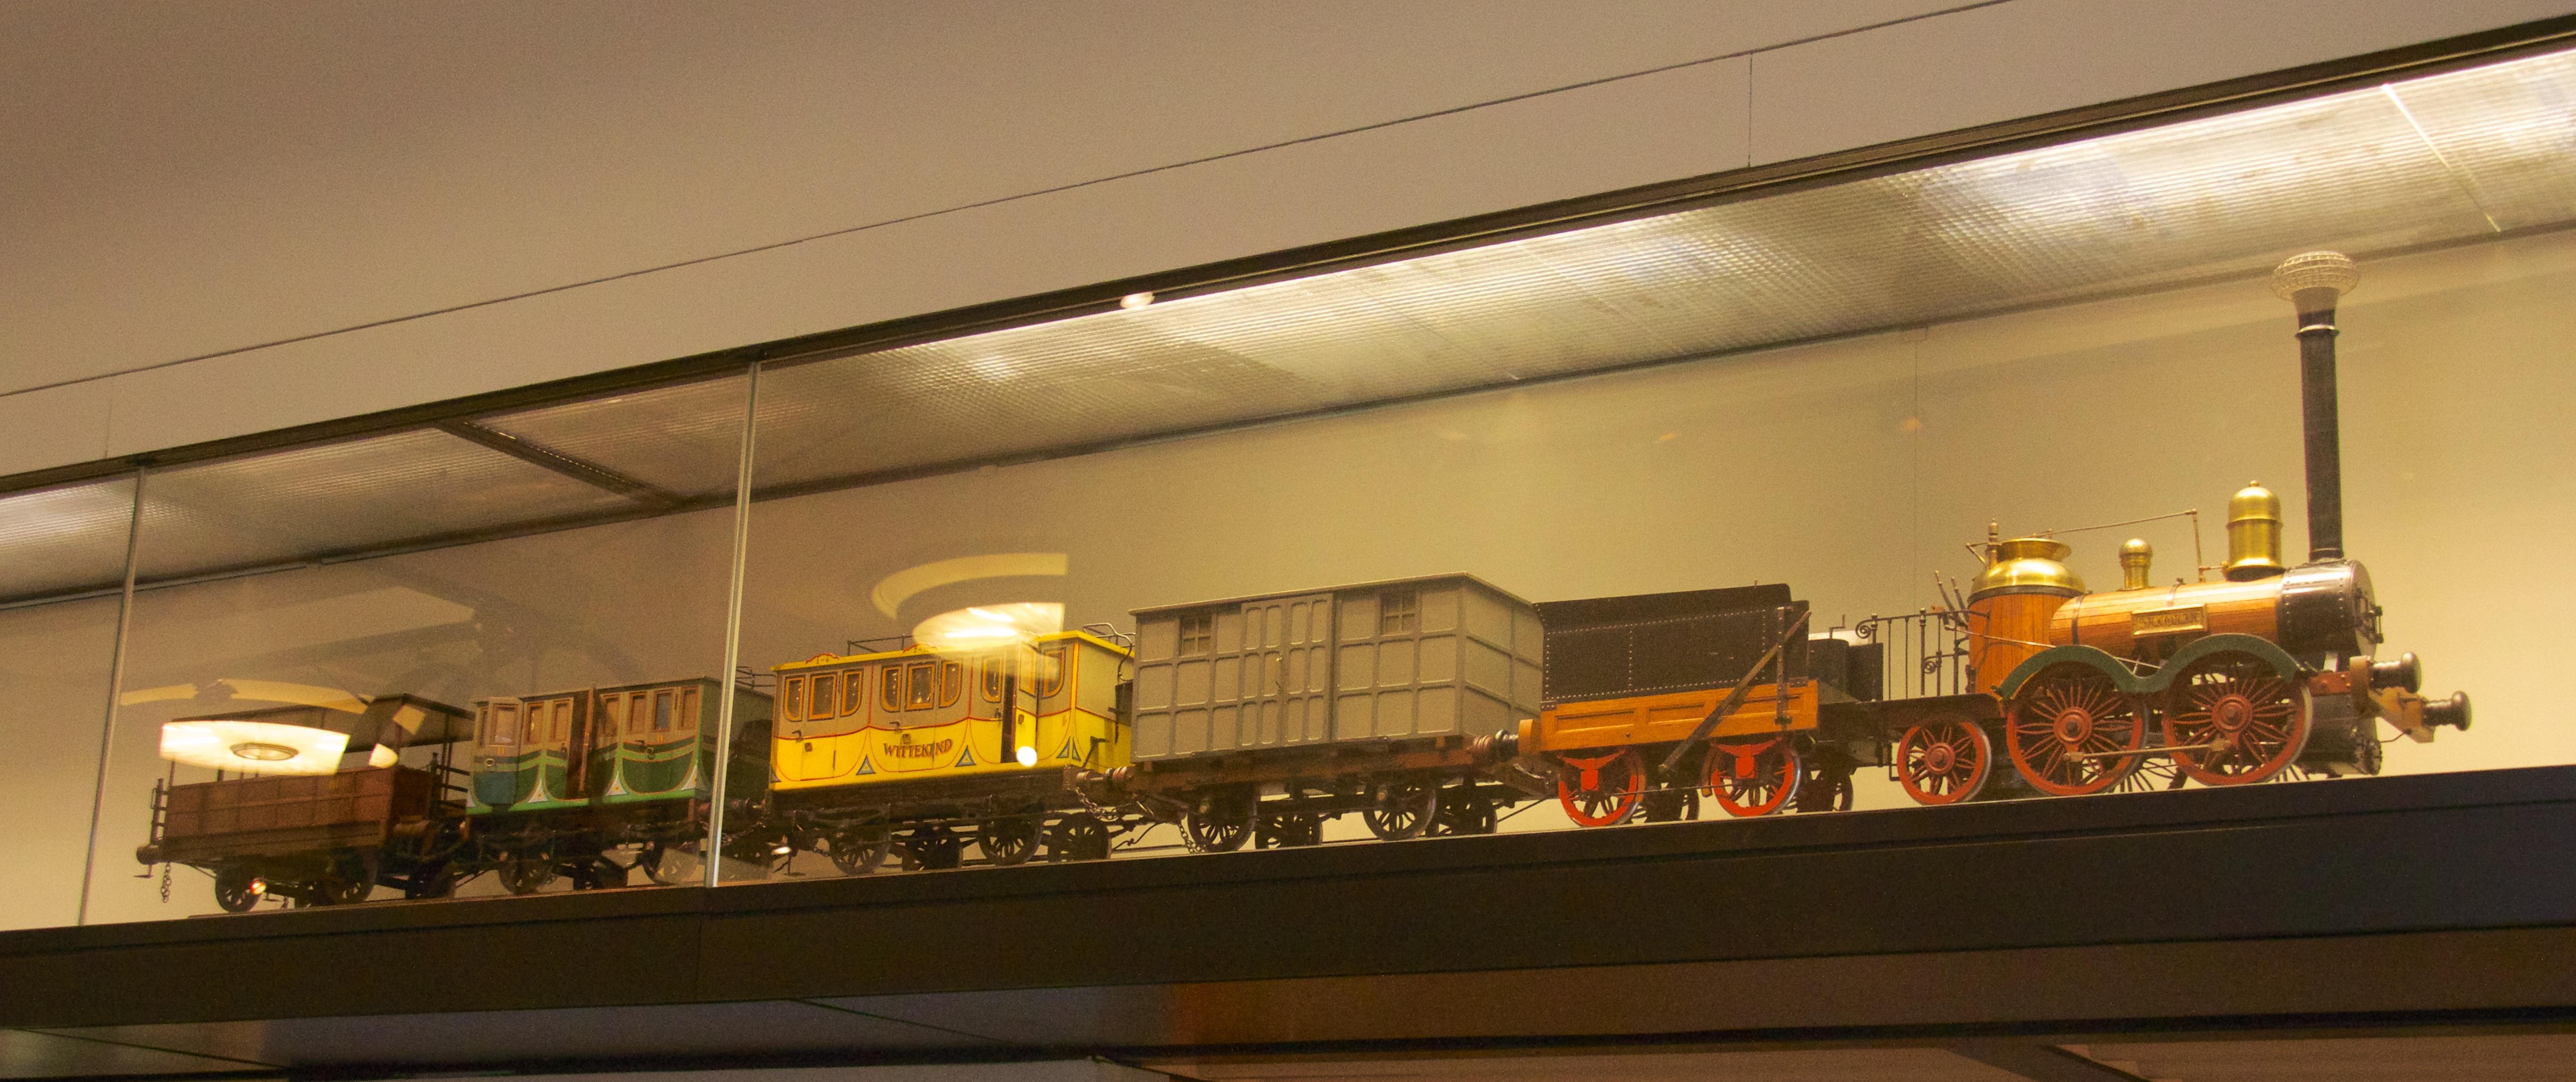 saxonia locomotive Gallery